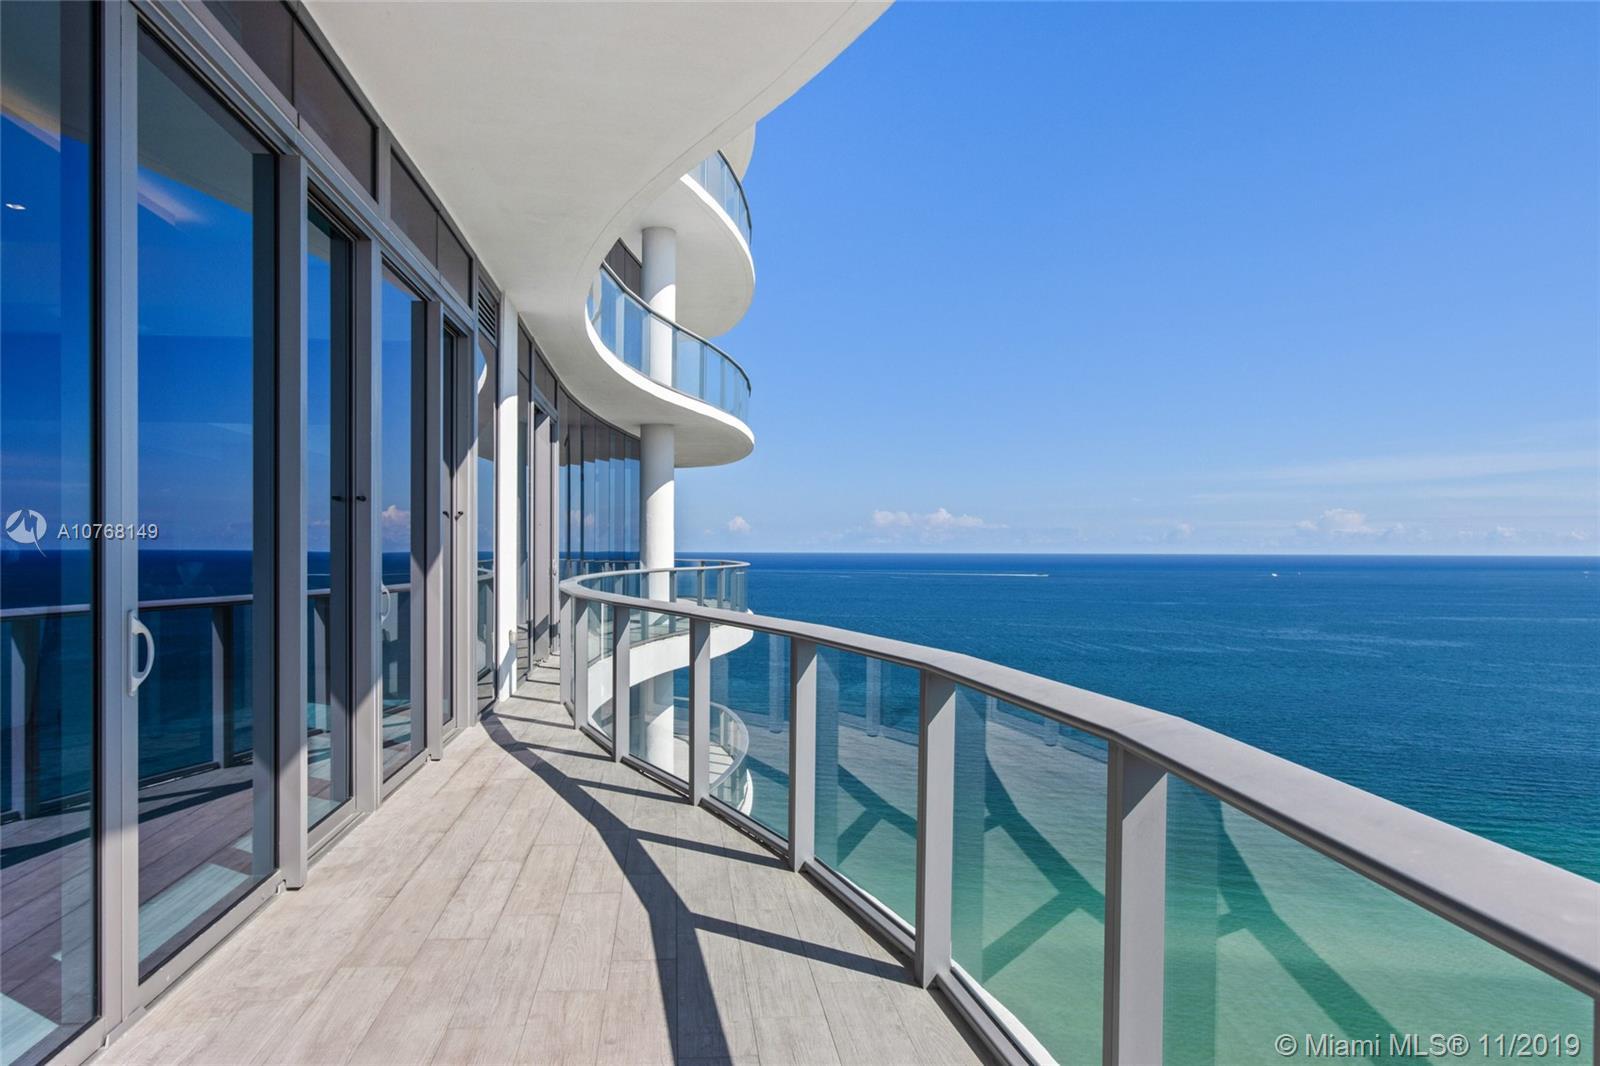 17475 Collins Ave Sky Villa, Sunny Isles Beach, FL 33160